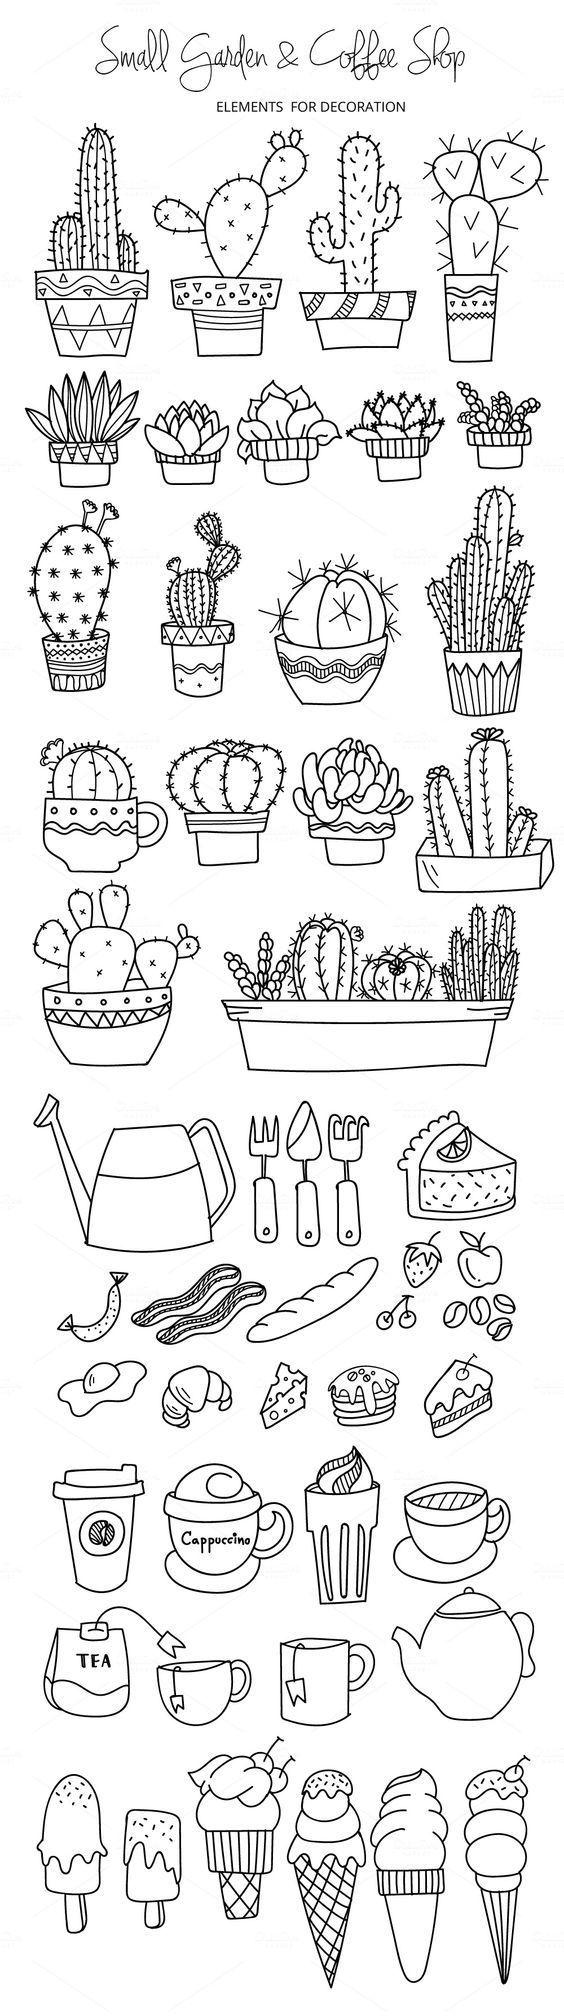 Small Garden & Coffee Shop Illustrations: cactus